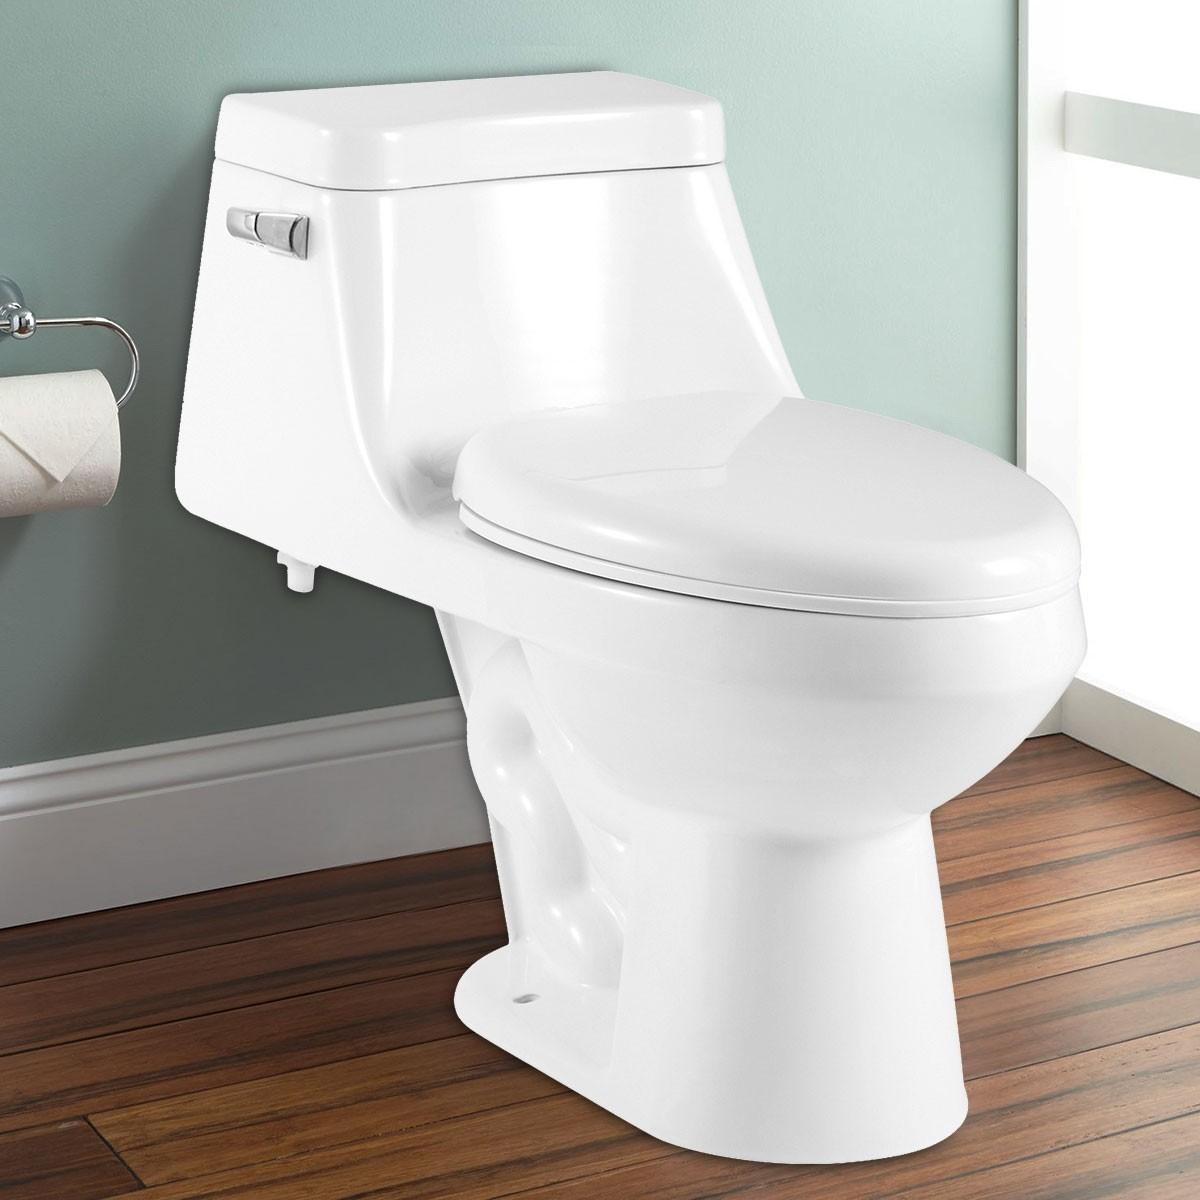 Single Flush Siphonic One-piece Toilet (DK-ZBQ-12228)